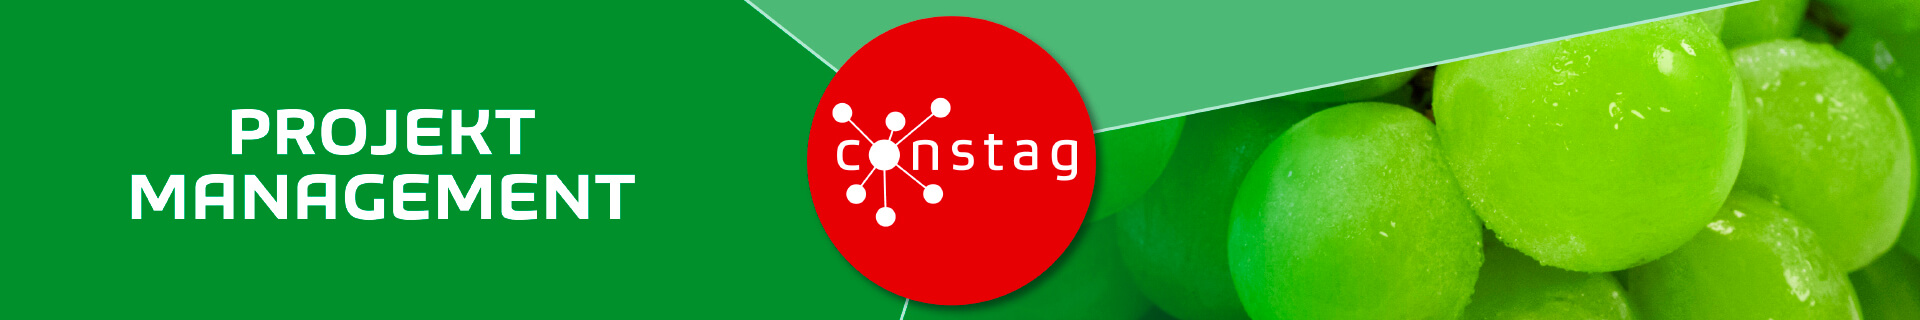 Constag Produkte Projekt Management Neutral